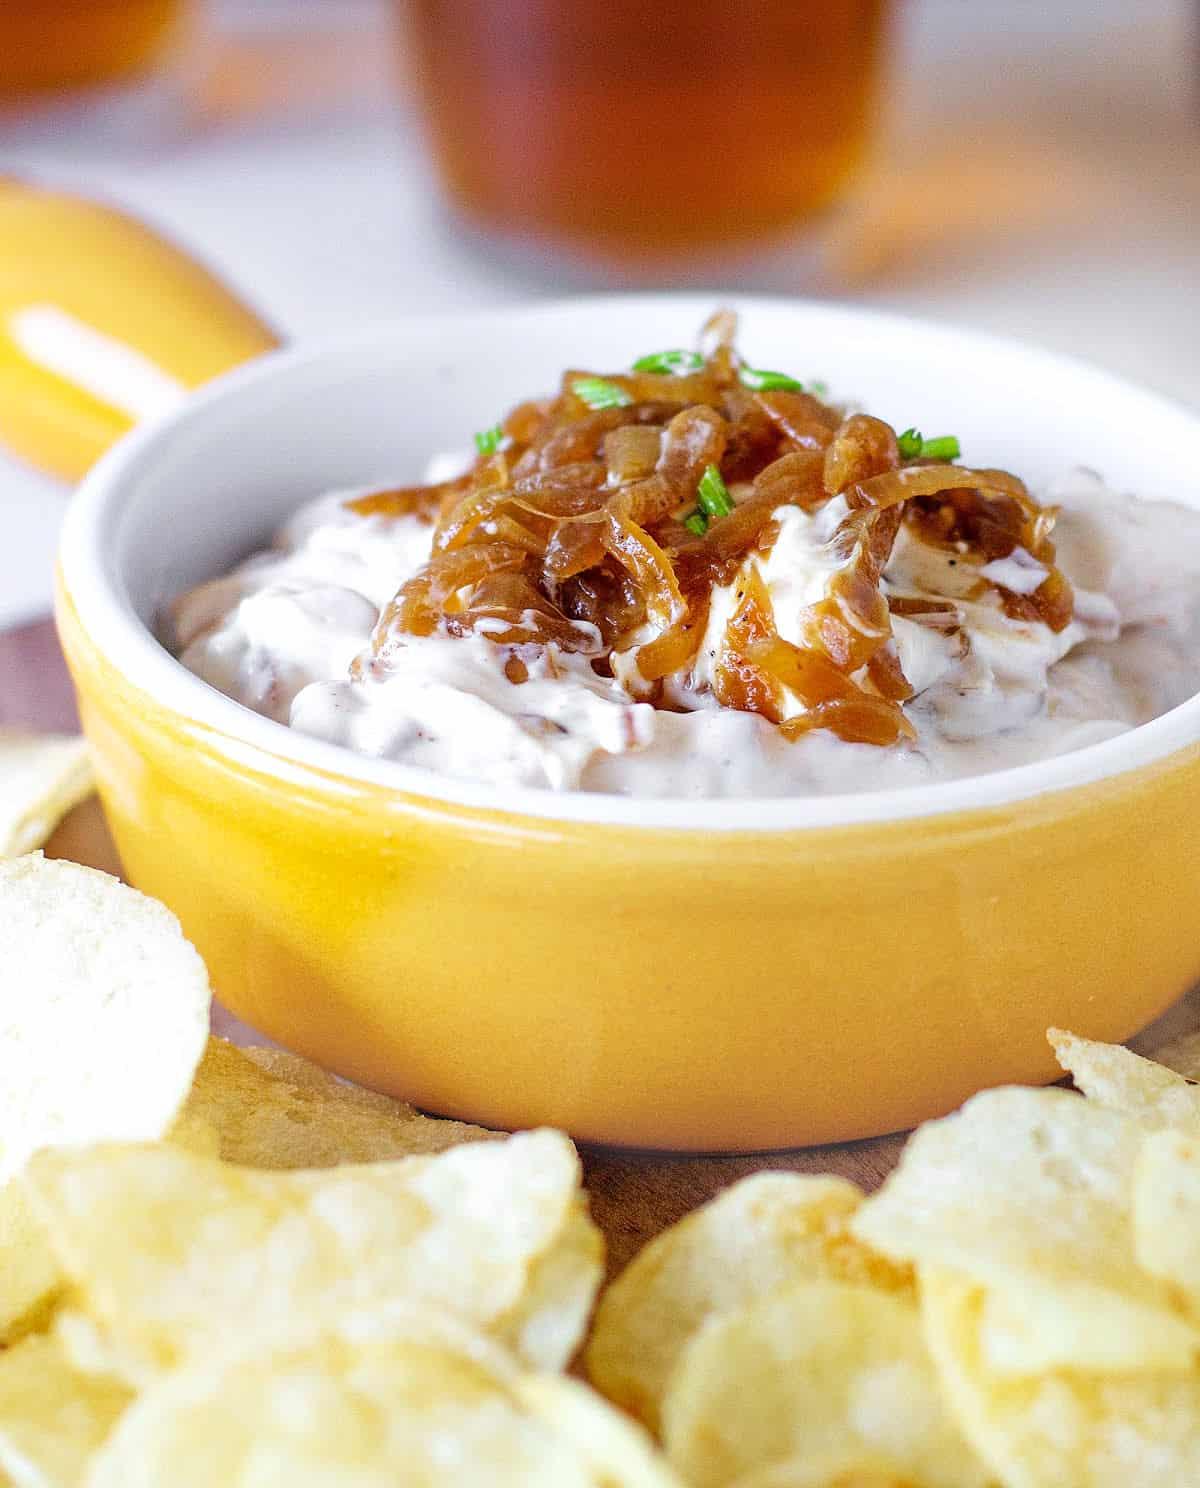 Shallow yellow bowl with onion dip, potato chips around